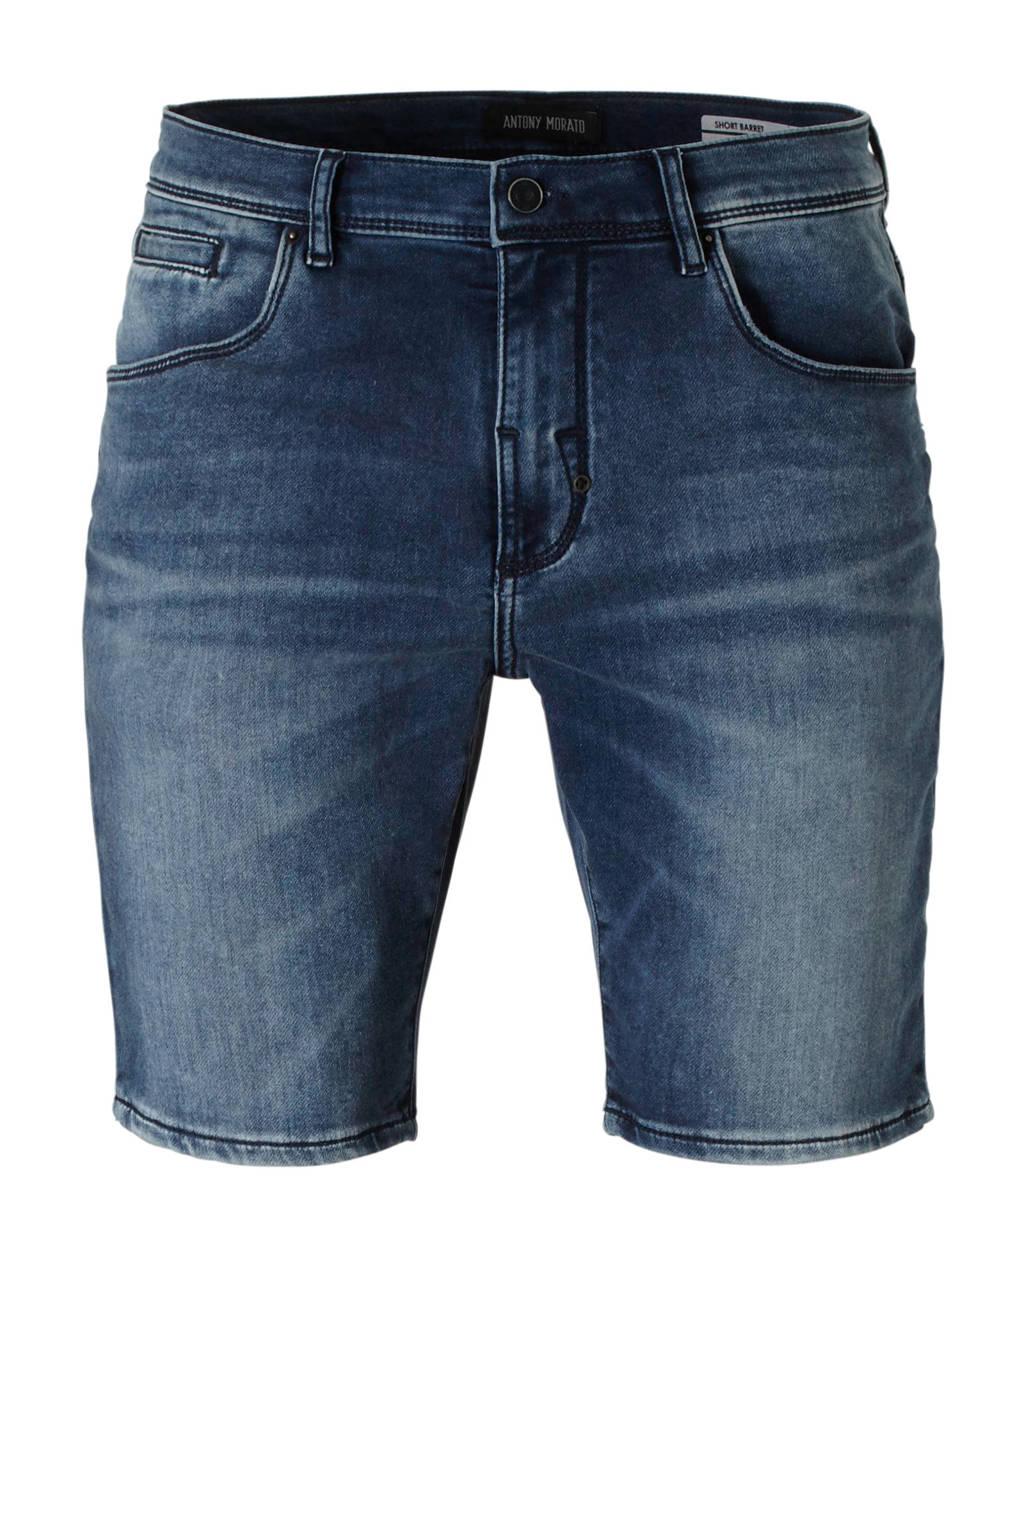 Antony Morato skinny fit jeans short, Donkerblauw